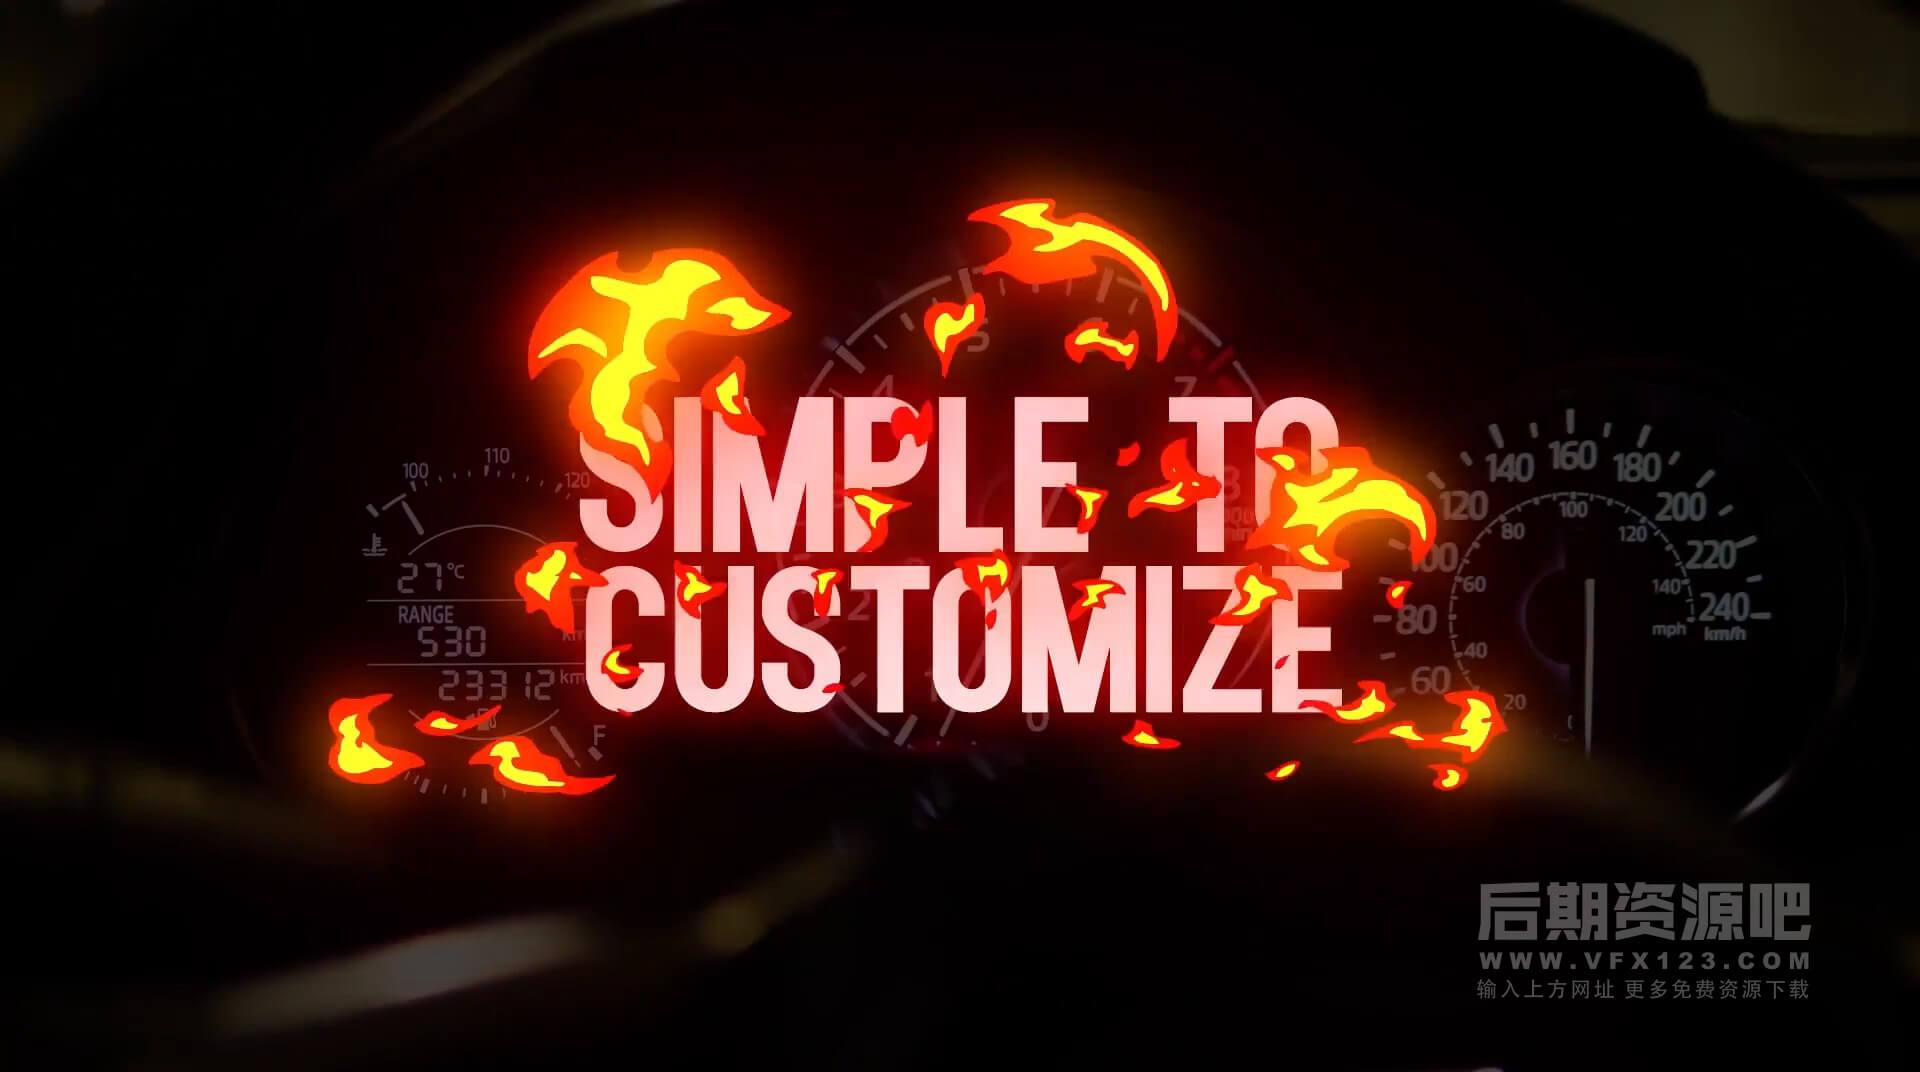 FCPX插件 2D卡通手绘火焰标题片头制作模板 带音效转场 Extreme Titles